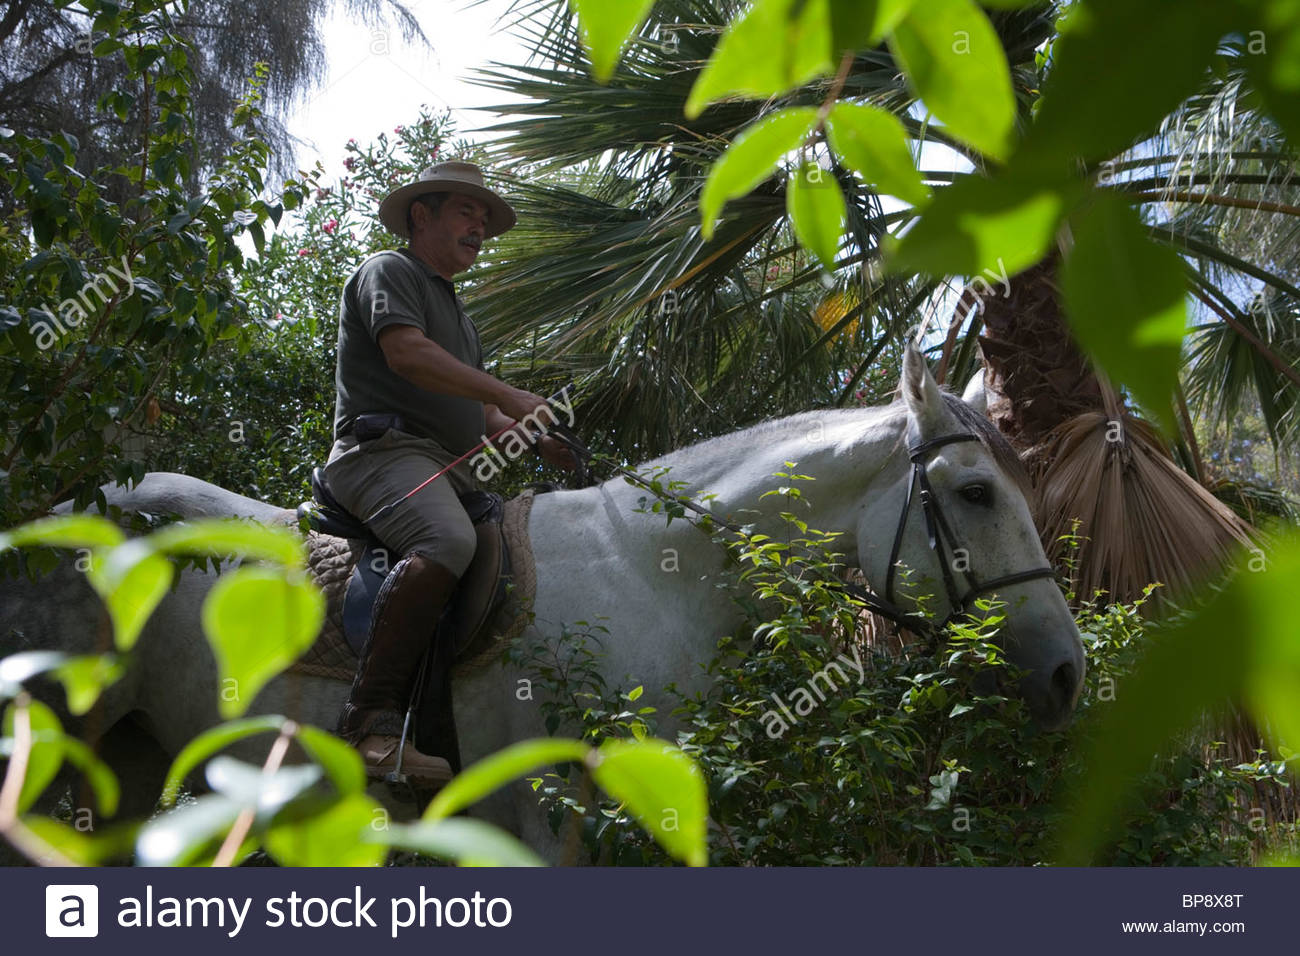 Man on horseback at the Centro Hipico Equestrian Center, Ponta, Porto Santo, near Madeira, Portugal - Stock Image